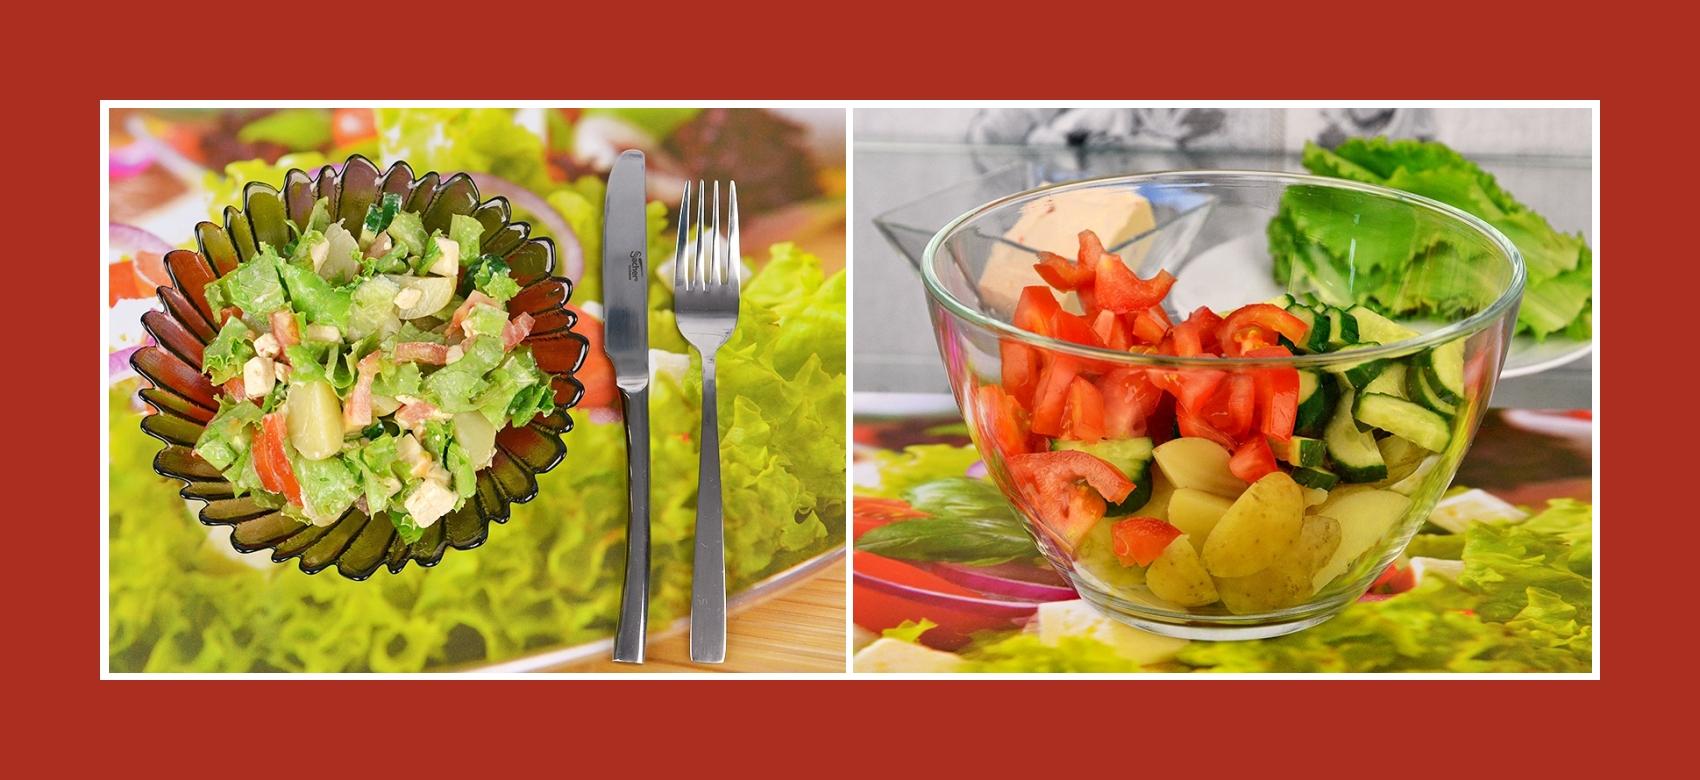 Salat aus Tomaten, Frühkartoffeln und Gurken